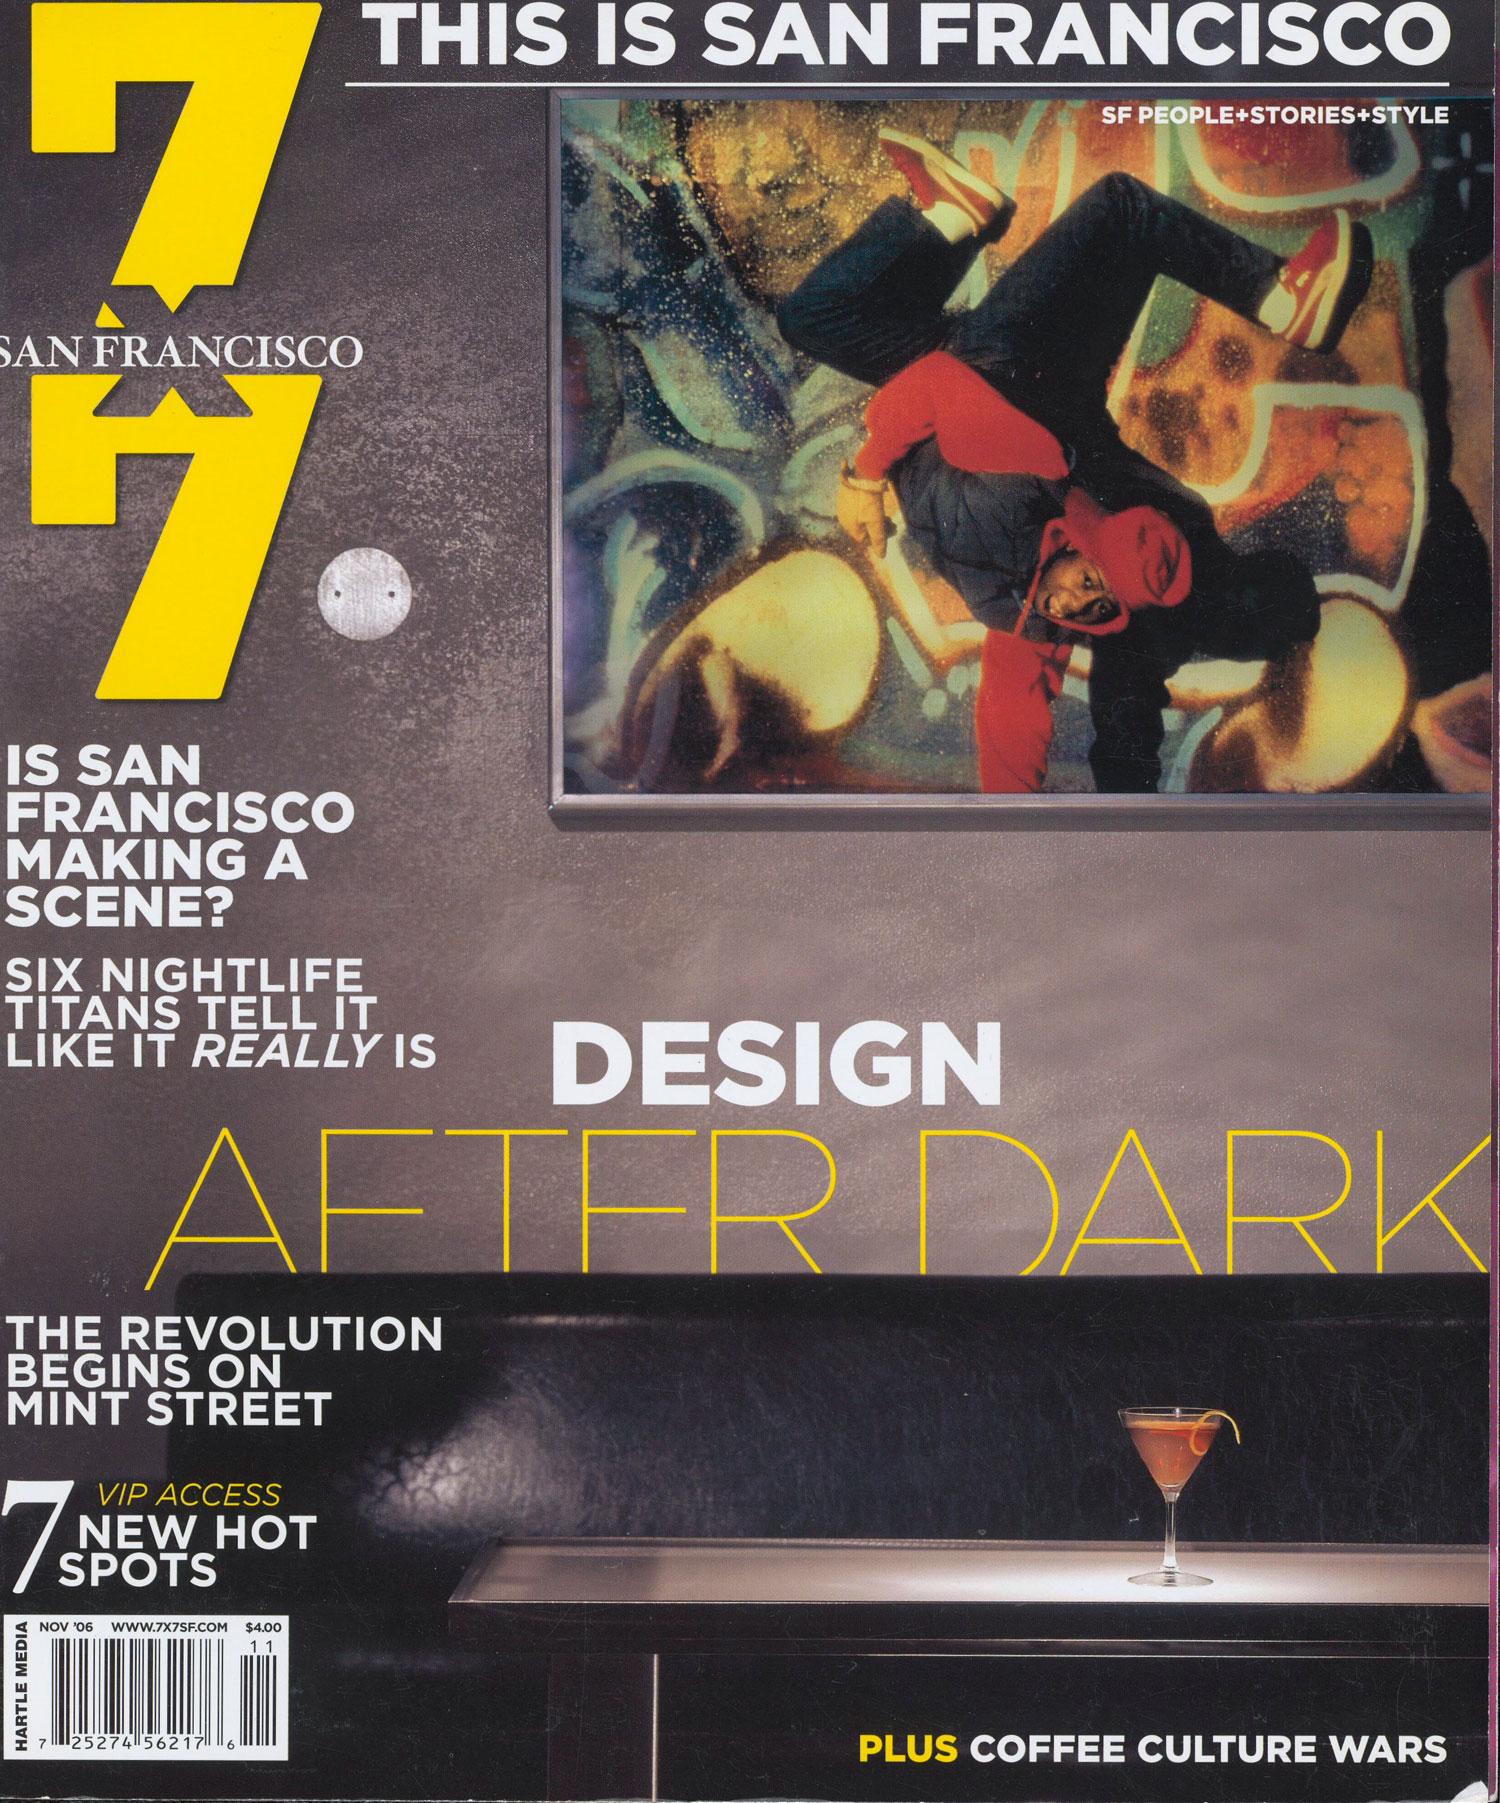 7x7cover.jpg